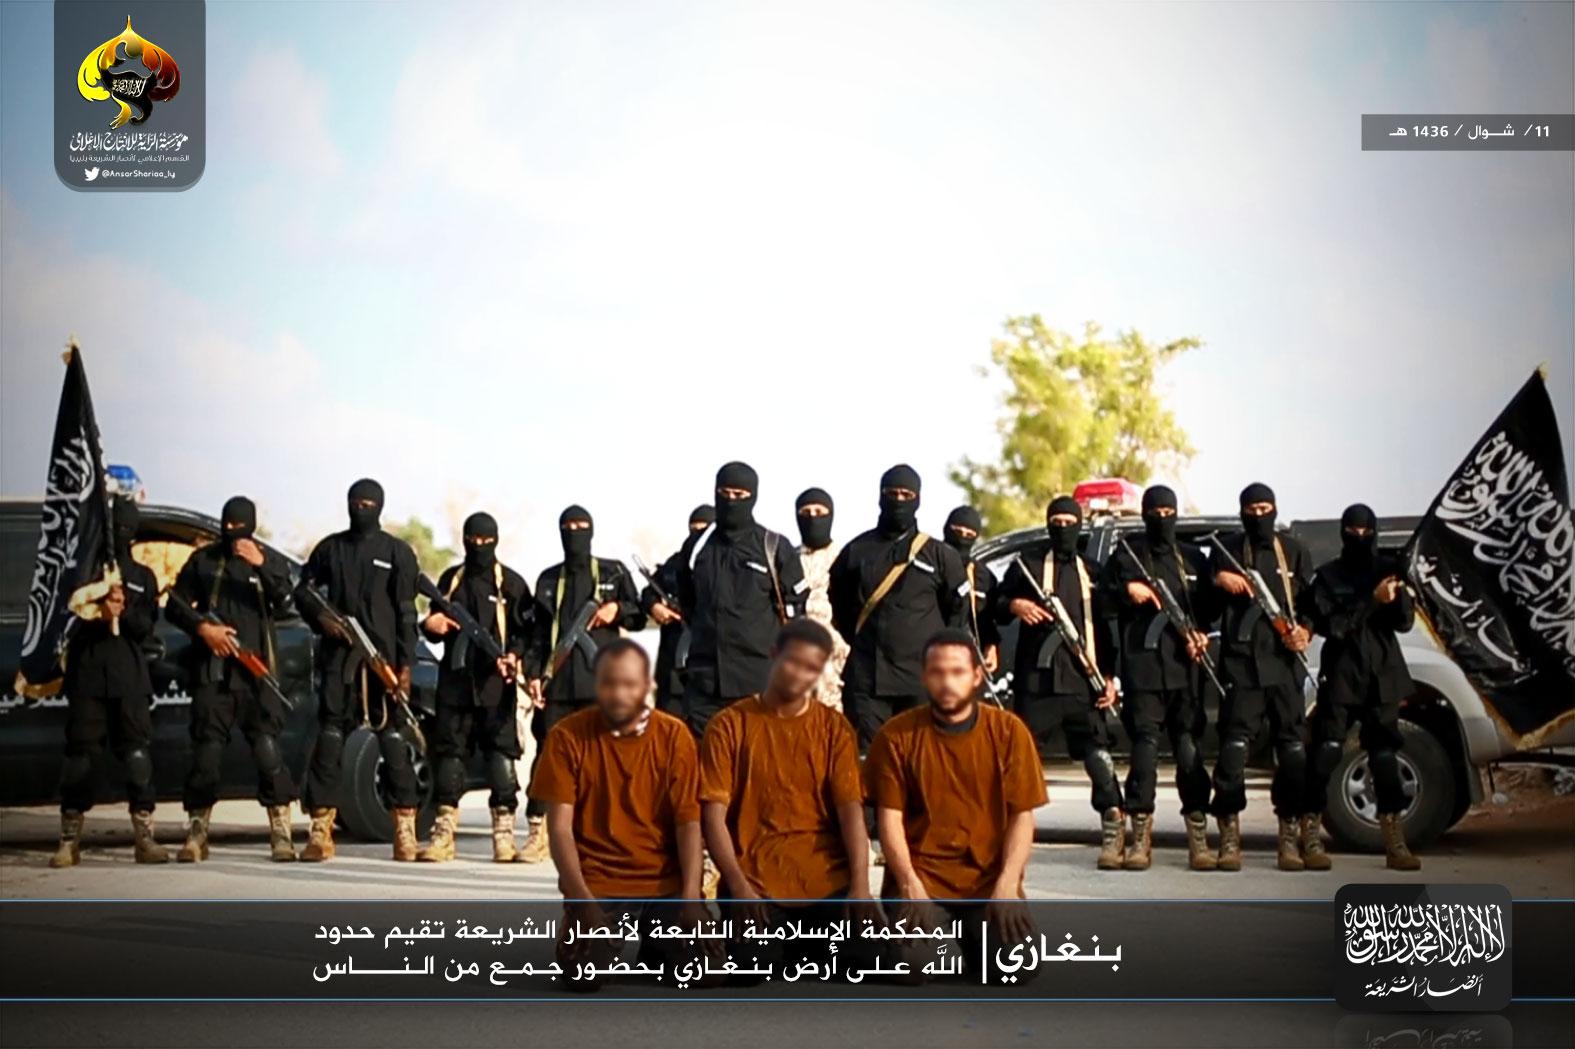 Ansar Sharia's Islamic Police in Benghazi